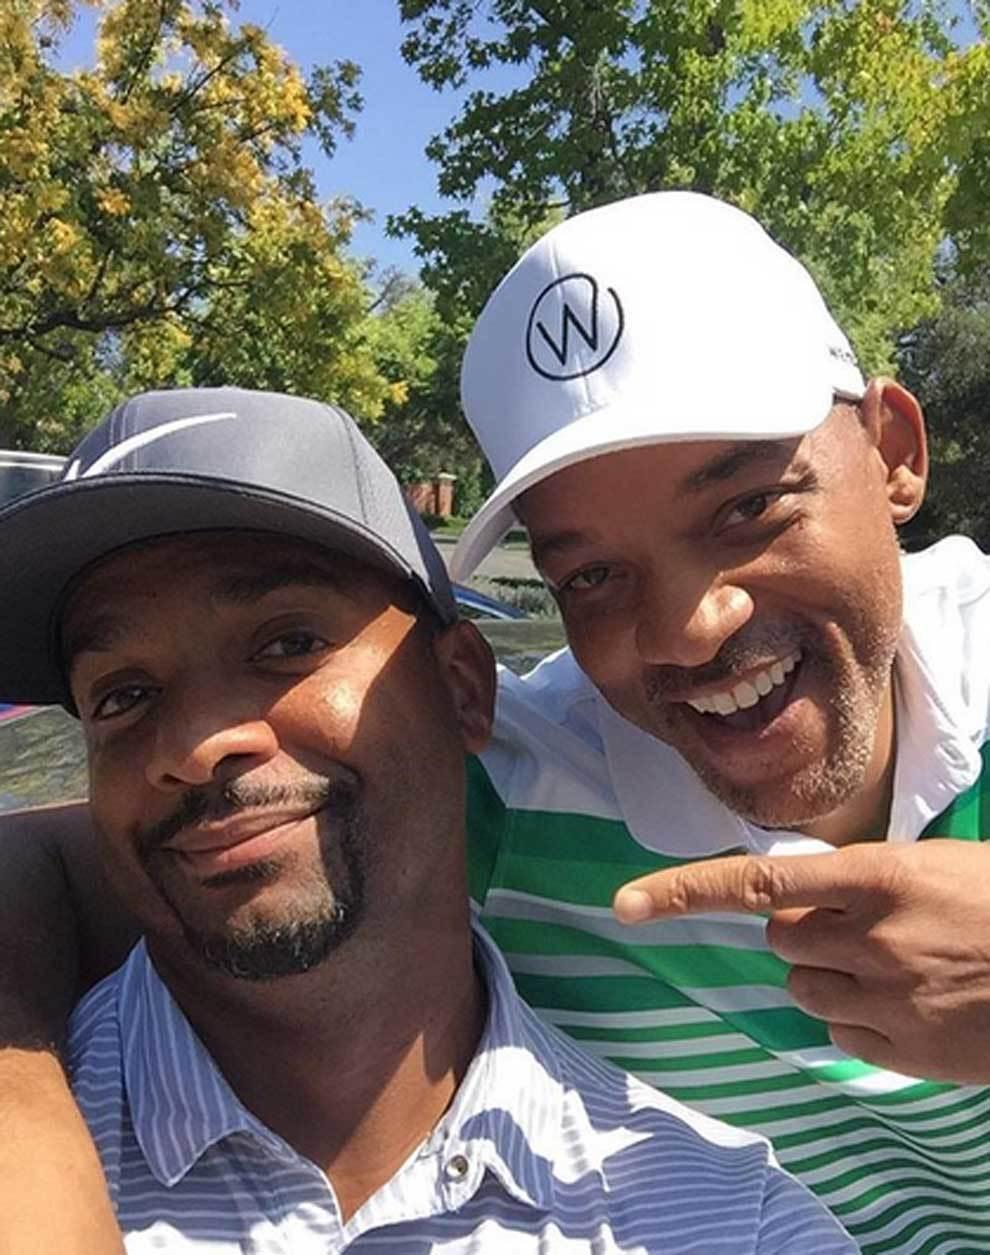 Will Smith y Alfonso Ribeiro jugando a golf